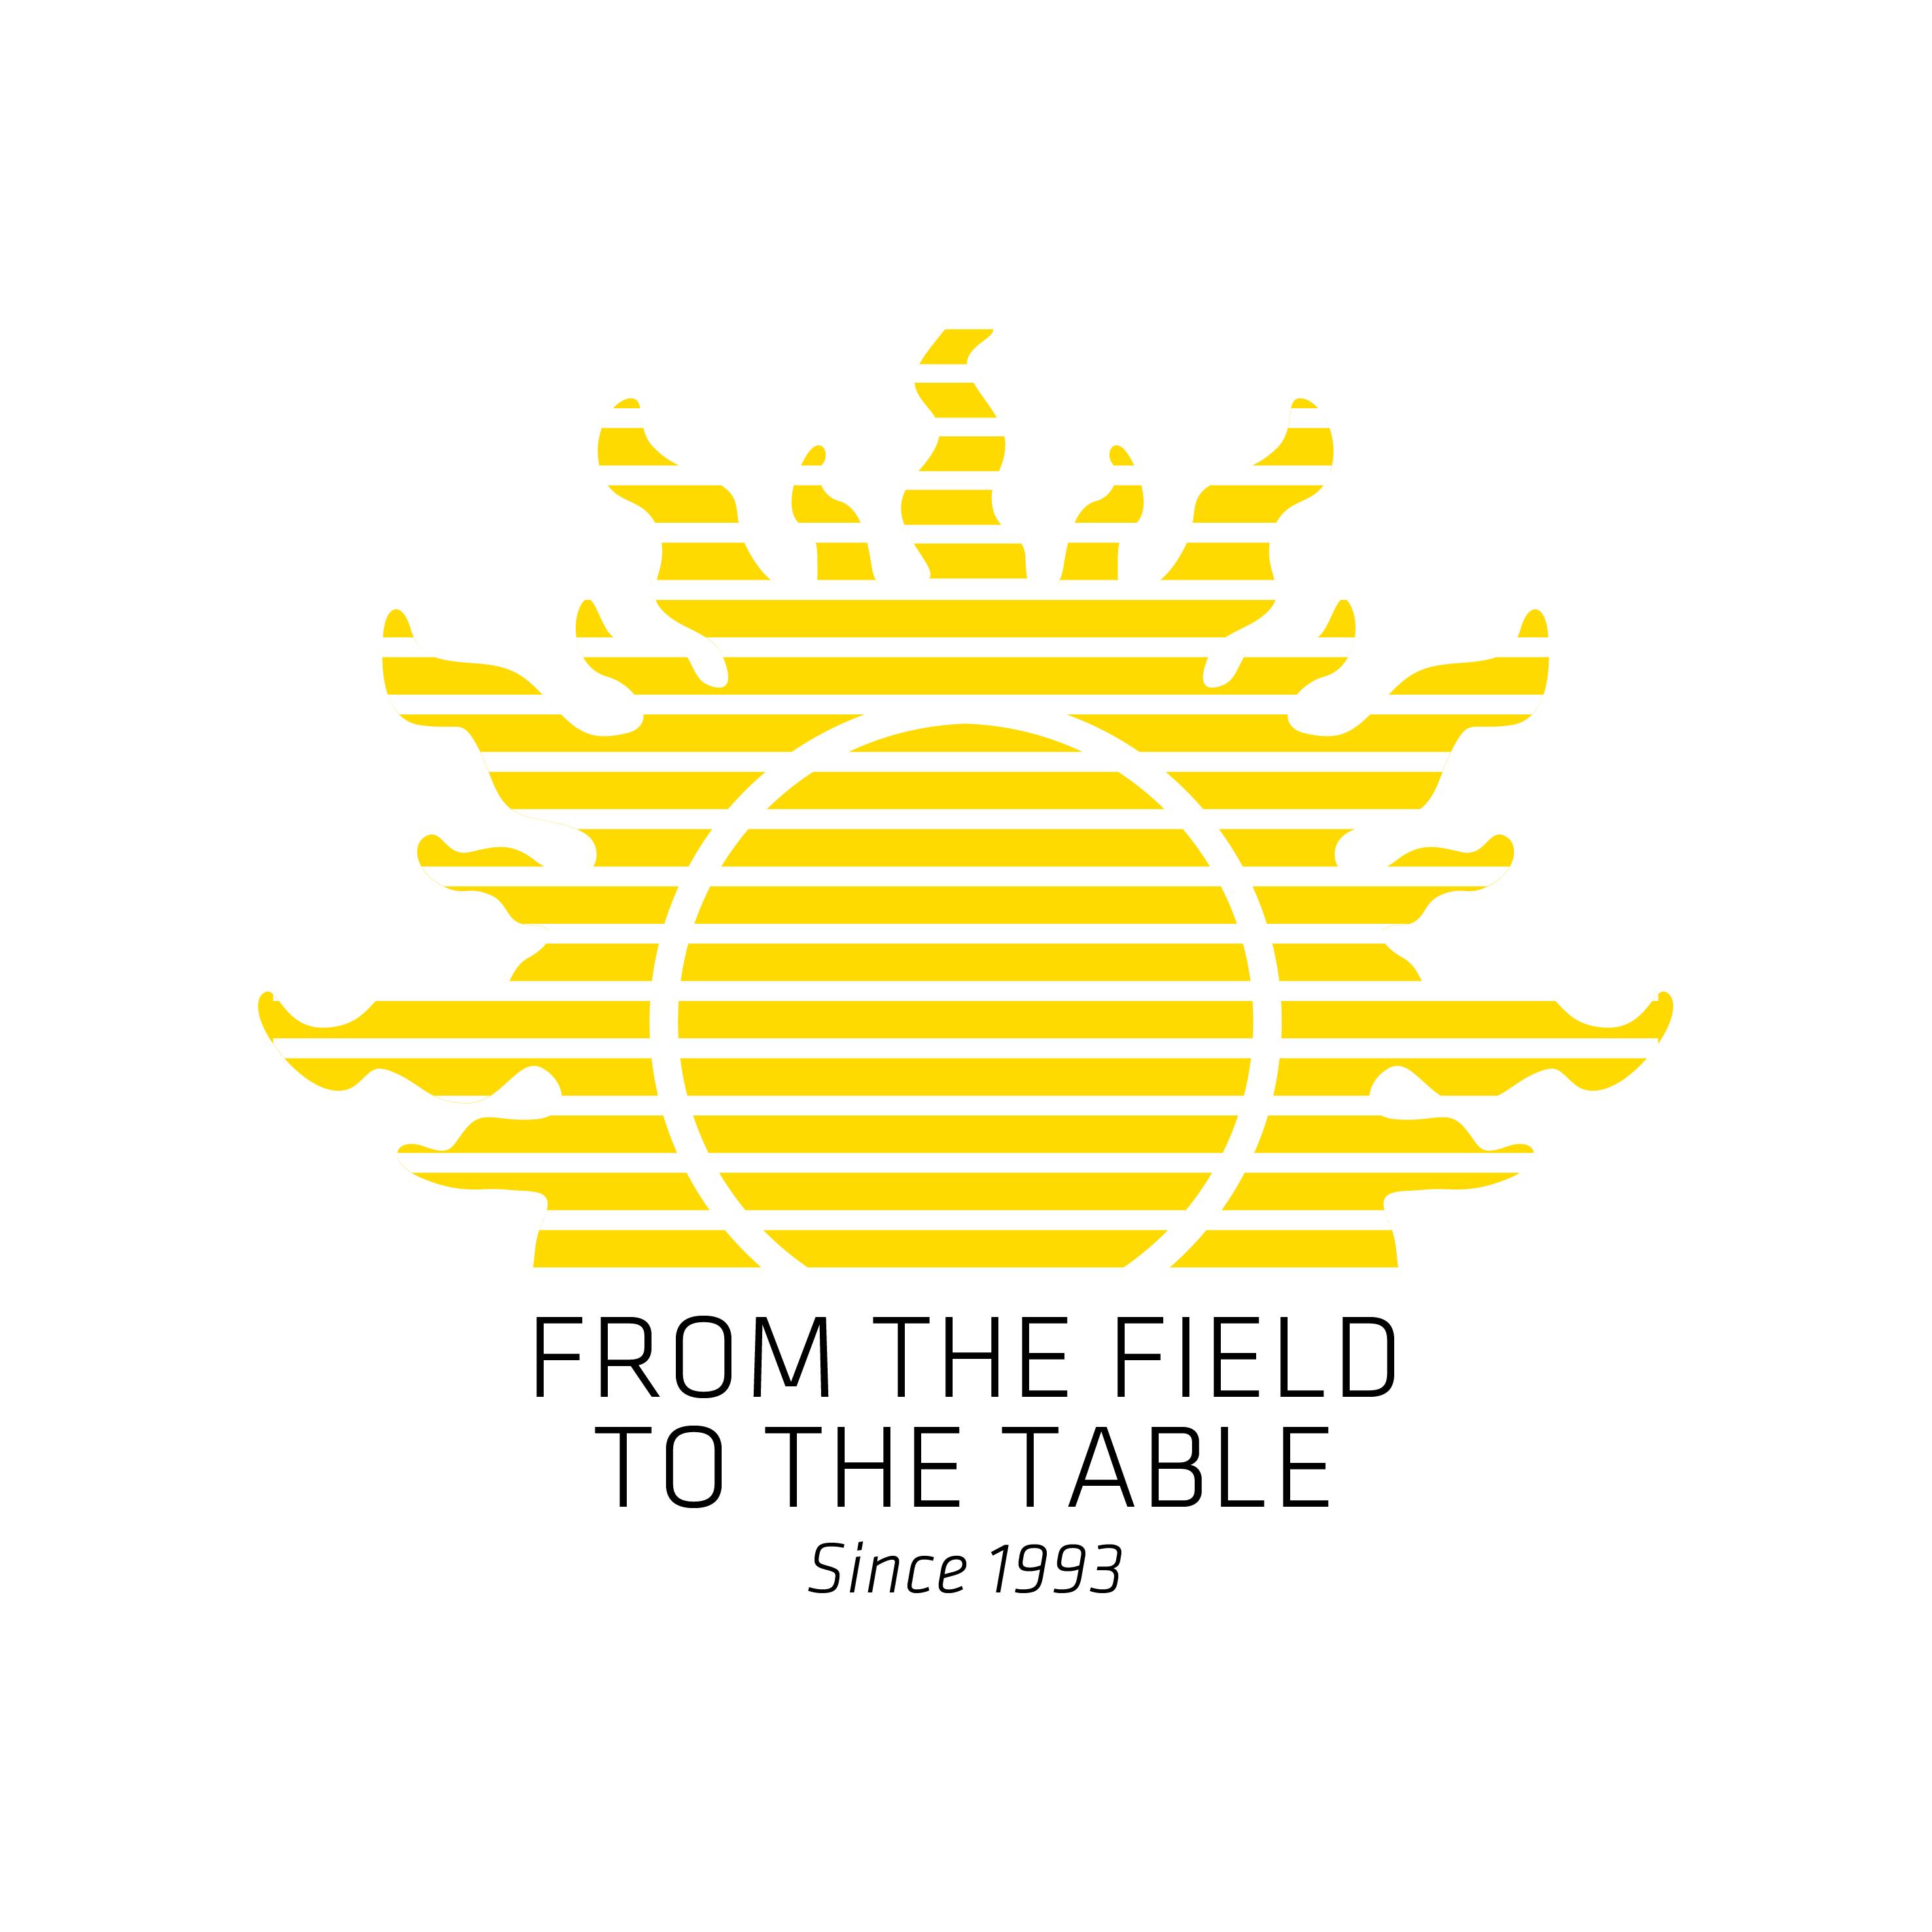 K.F.C.Gıda Tekstil Sanayi İthalat İhracat Yatırım A.Ş., K.F.C. GIDA A.S.